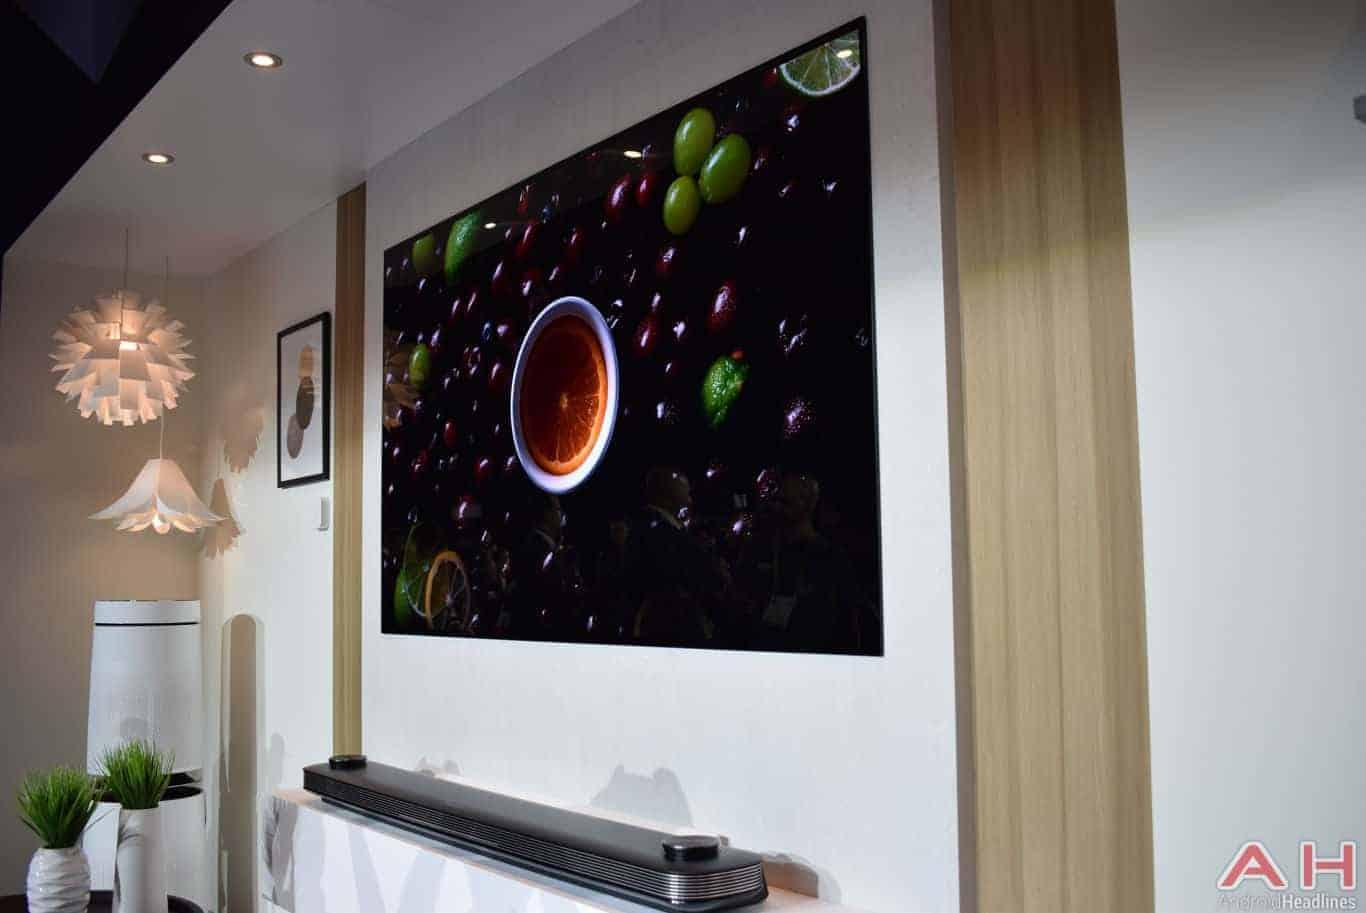 LG CES ThinQ TV AH 1 7